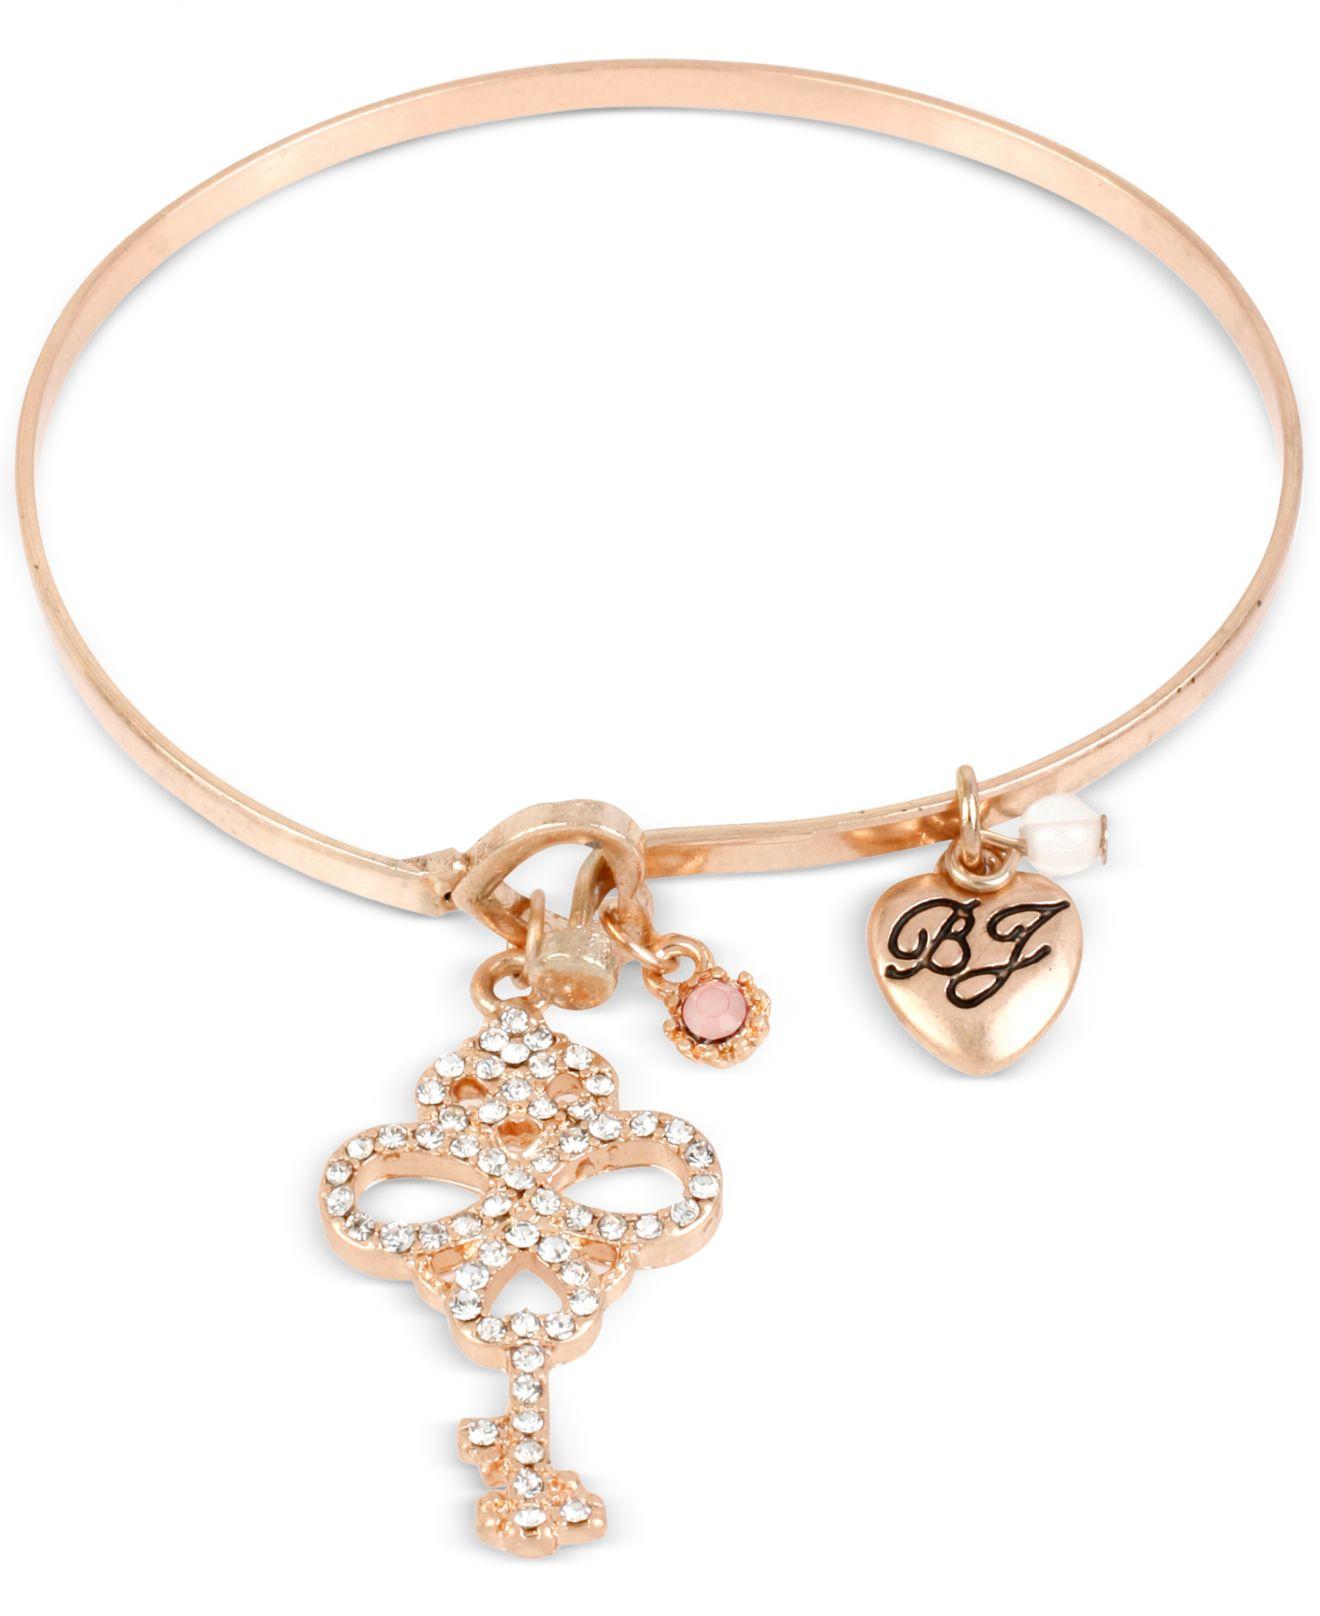 Betsey johnson Rose Gold-tone Key Charm Bangle Bracelet in ...